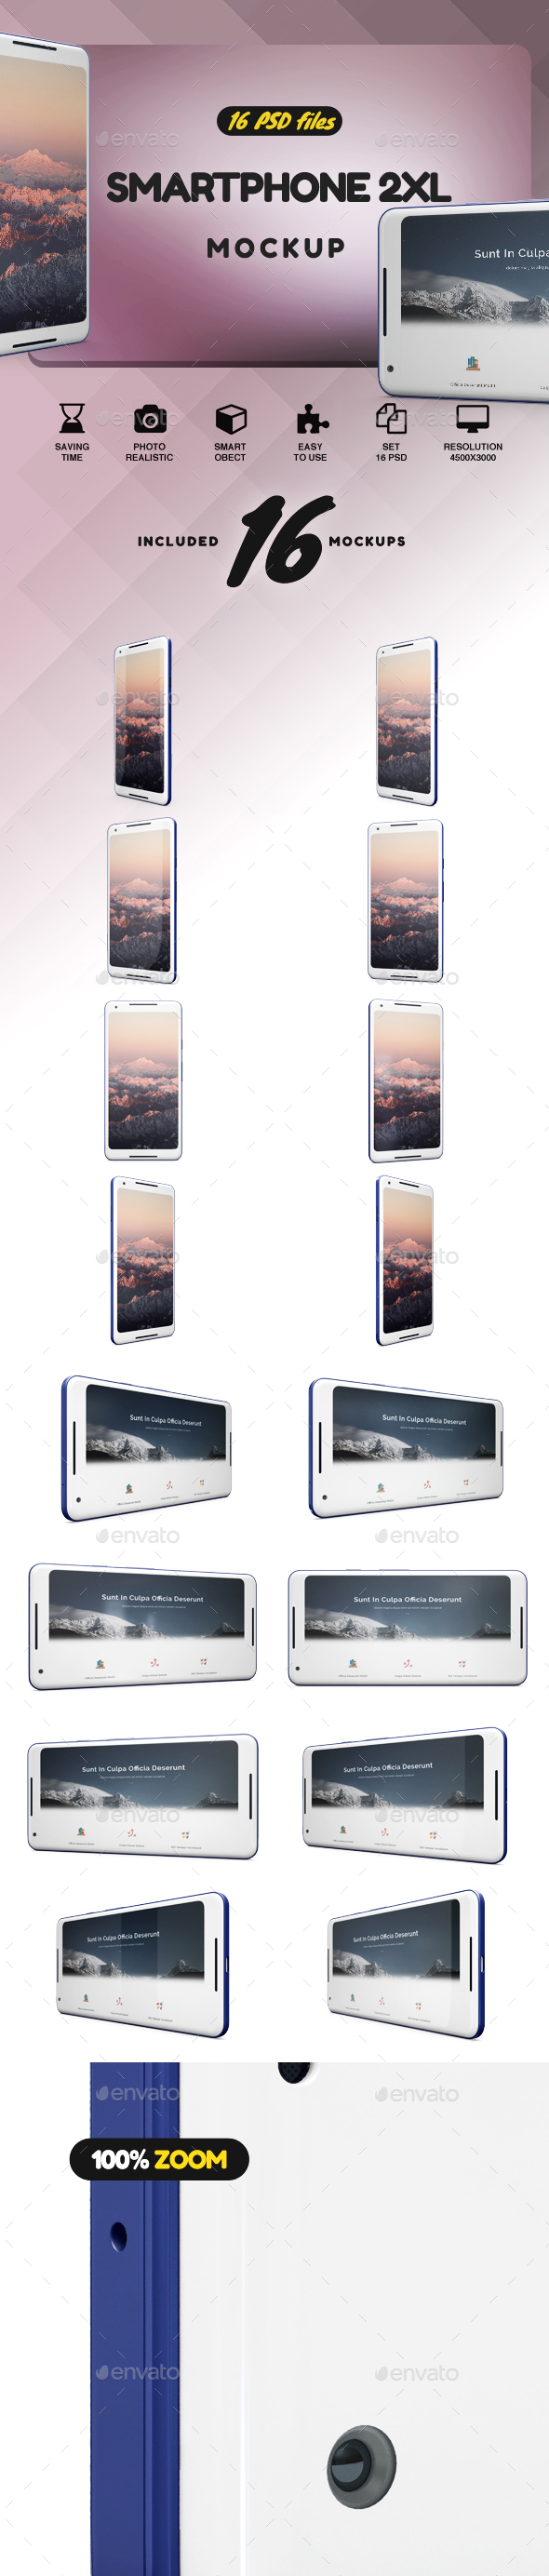 SmartPhone XL 2 App Mockup - Mobile Displays